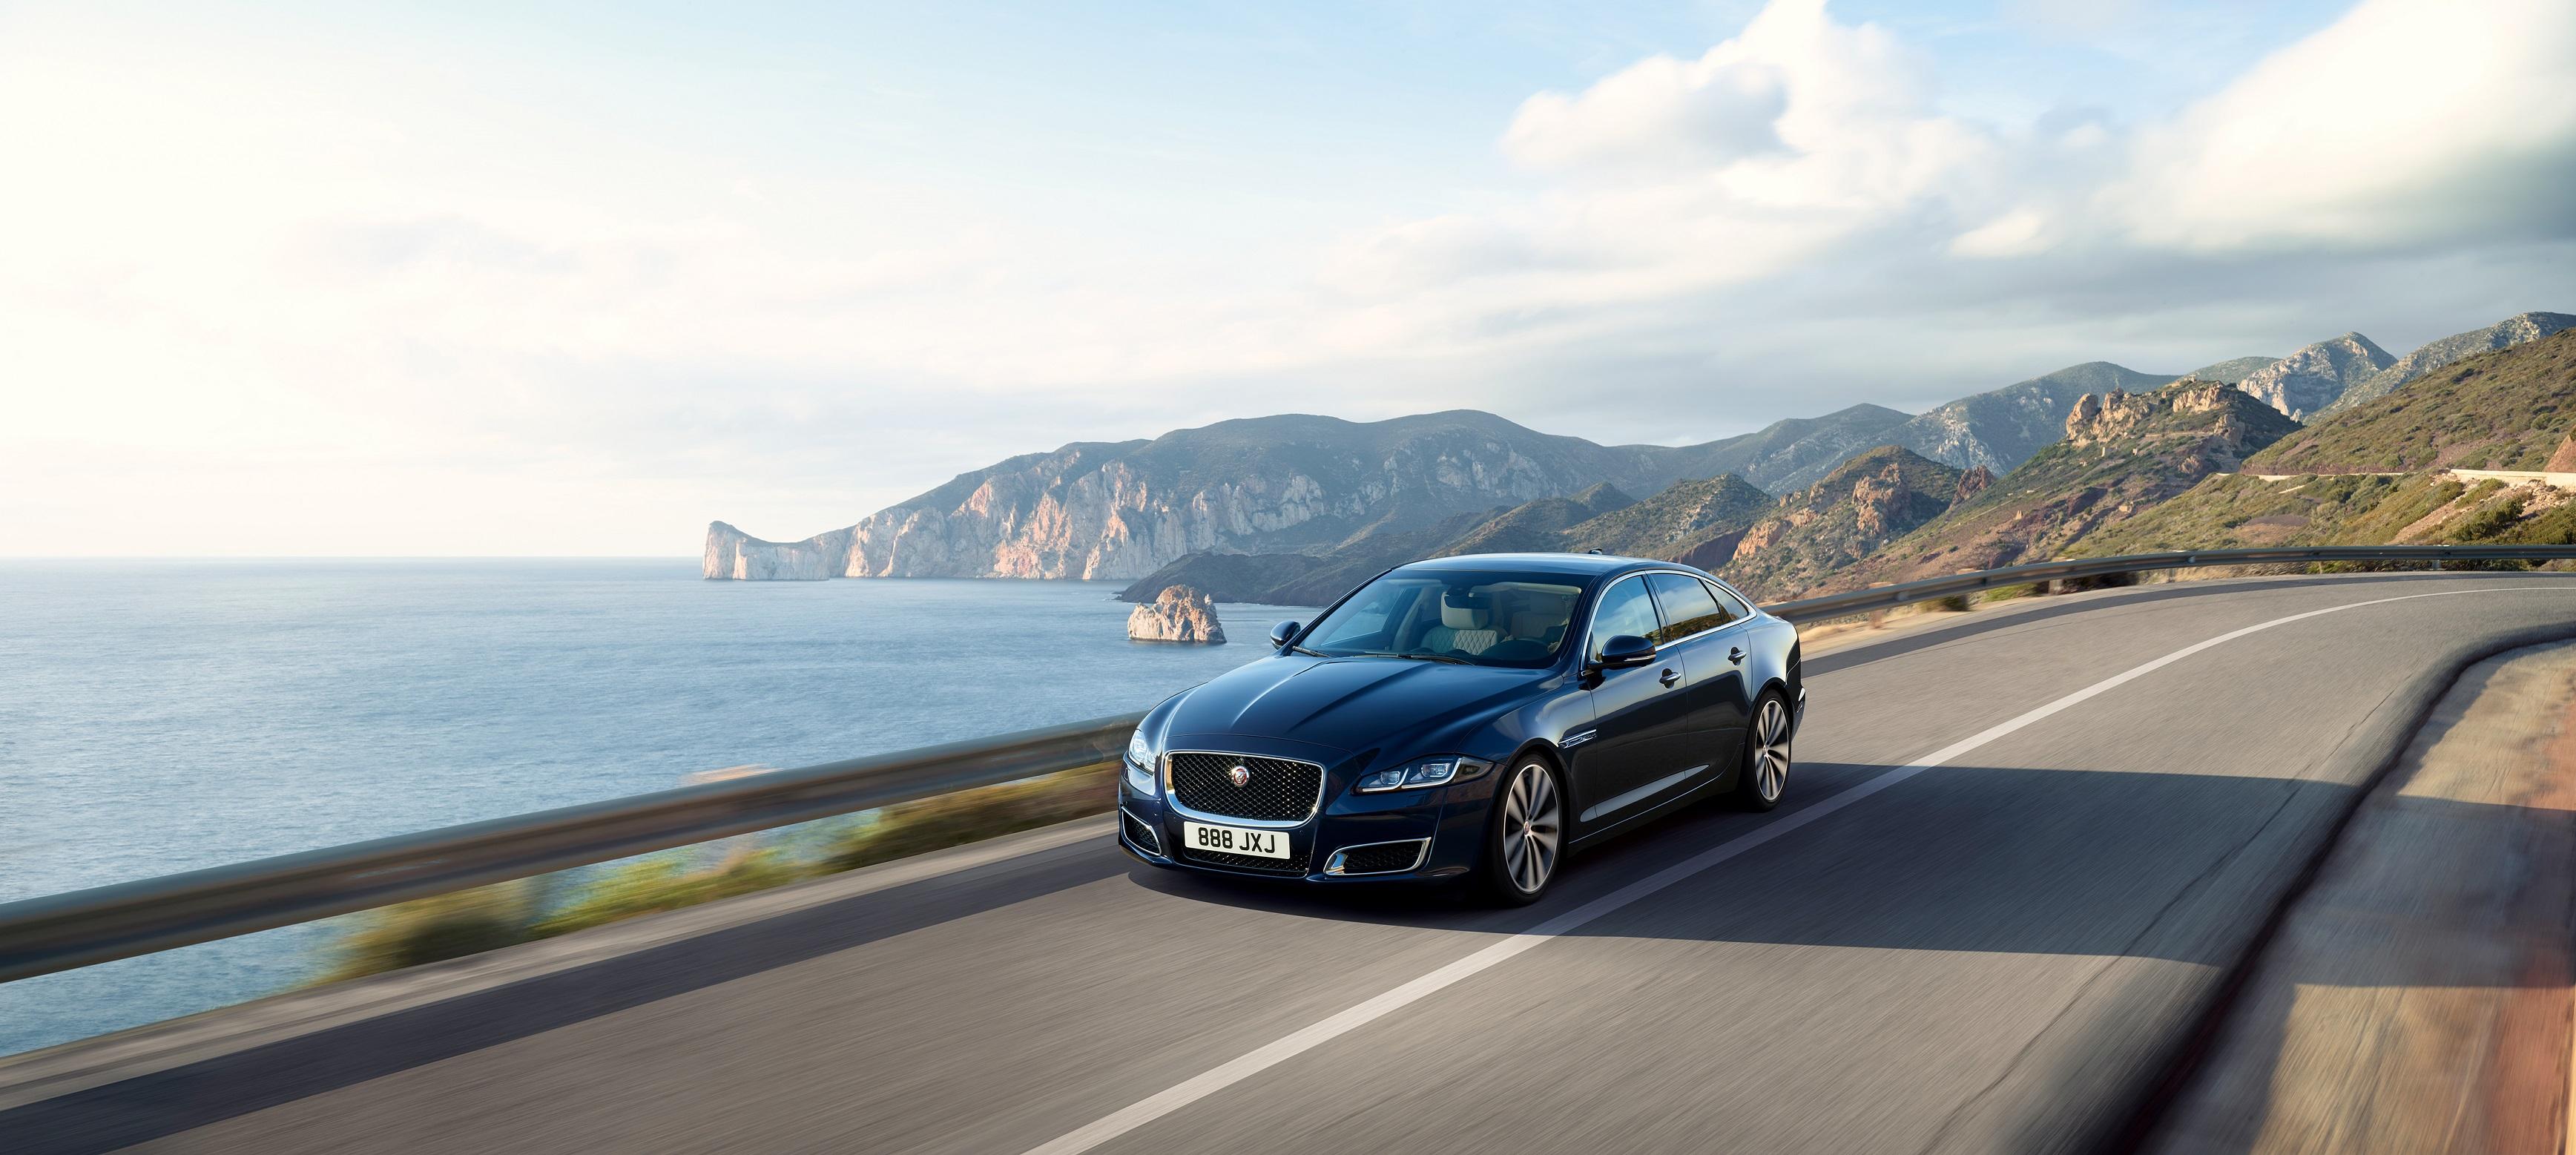 Photo of Jaguar XJ ends production run, next XJ will be an EV